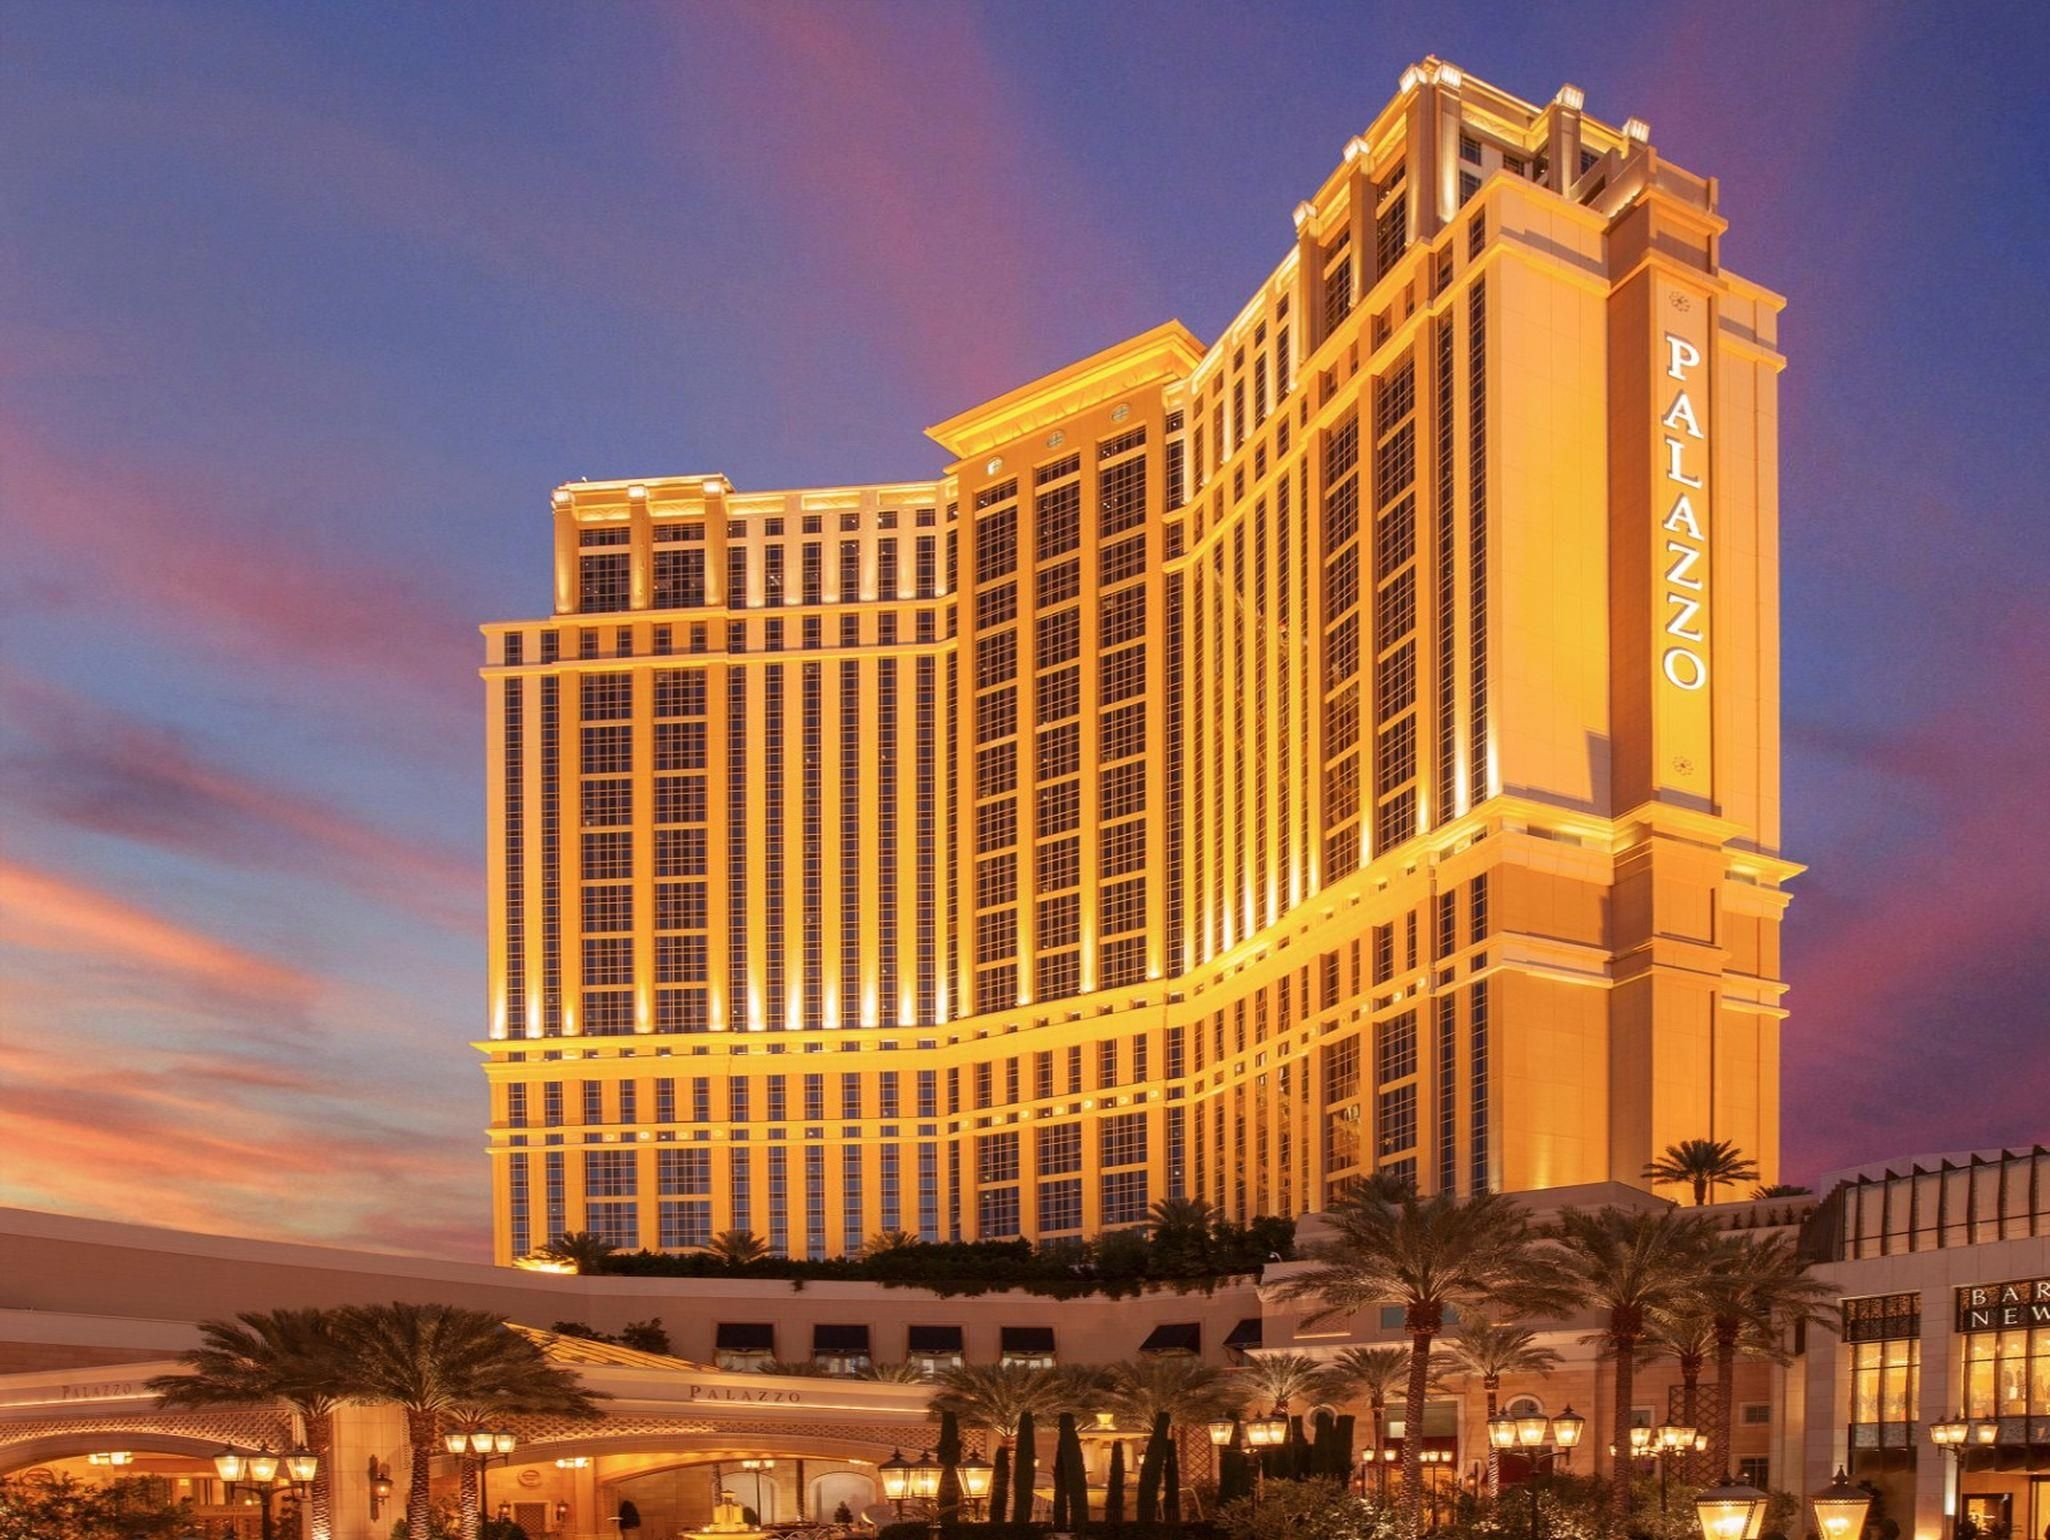 Las Vegas Nv The Palazzo Resort Hotel Casino United States